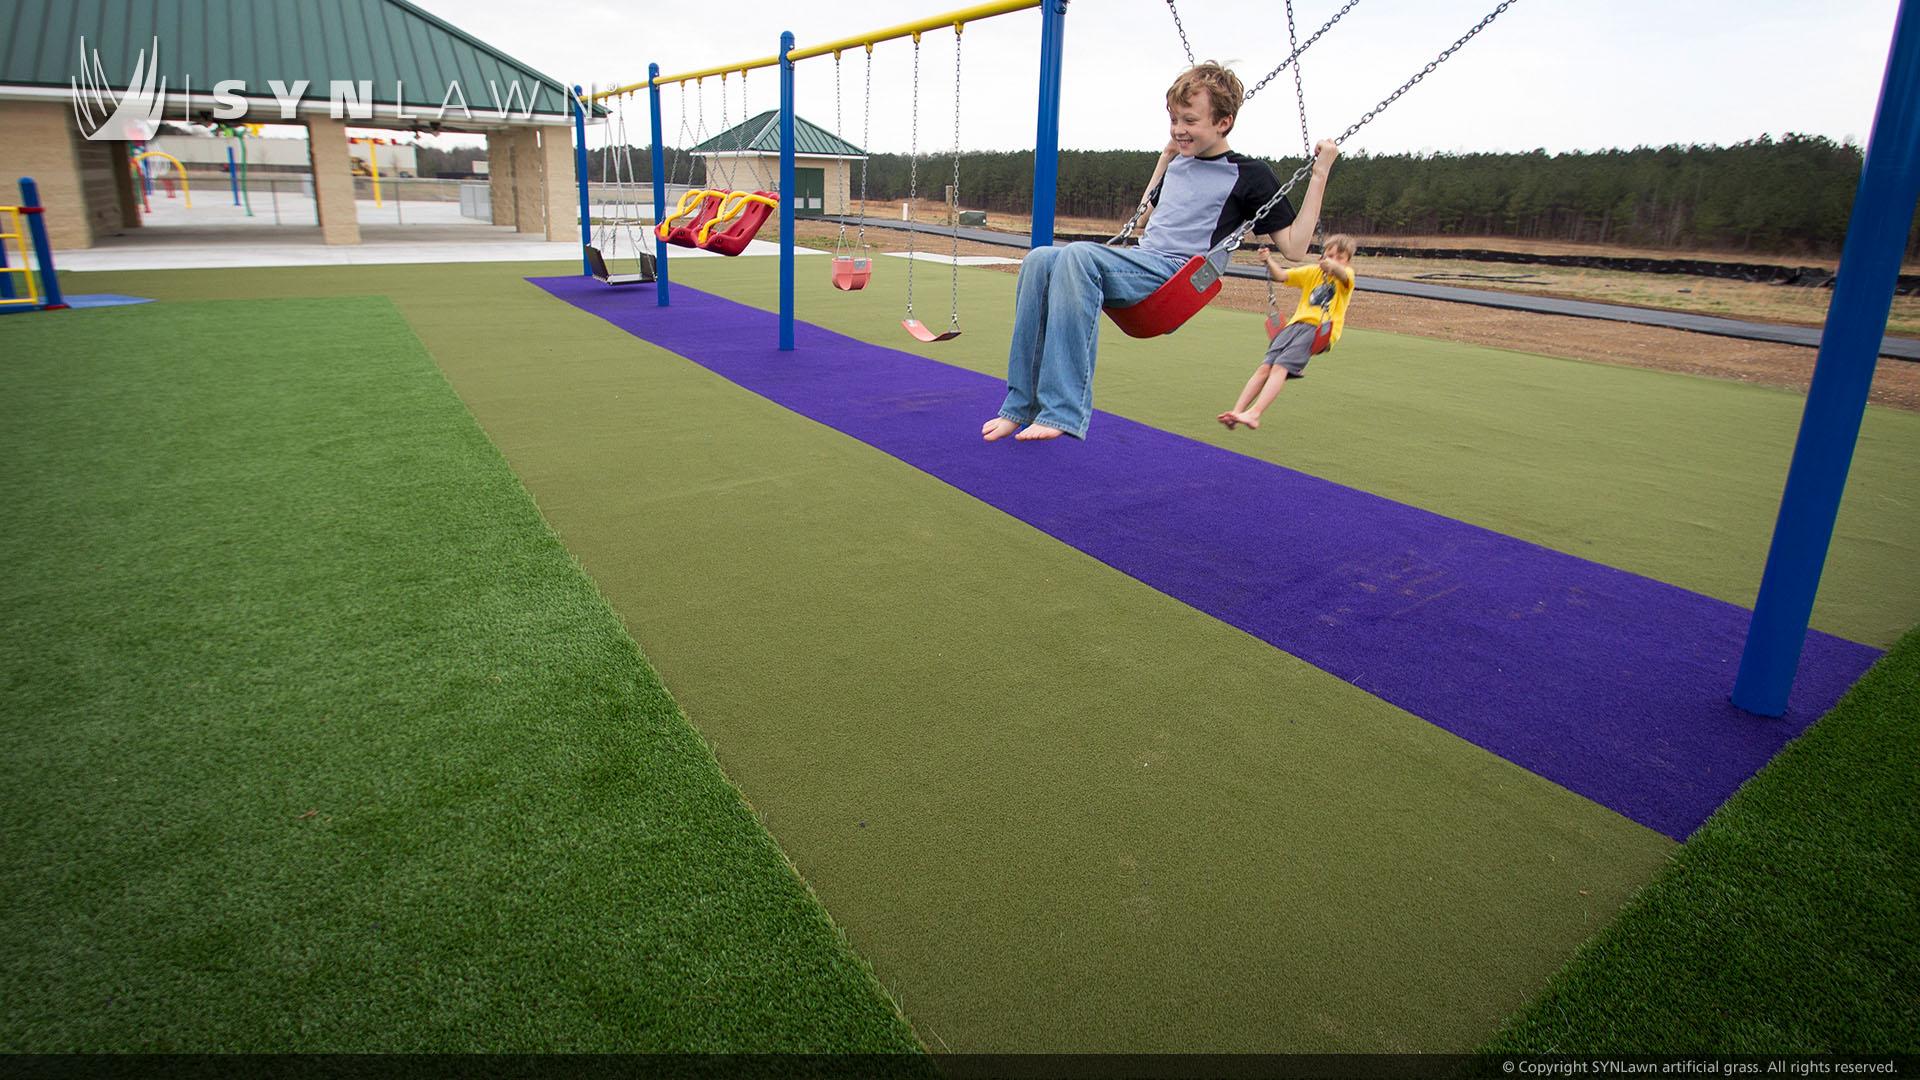 playground artificial grass for installation